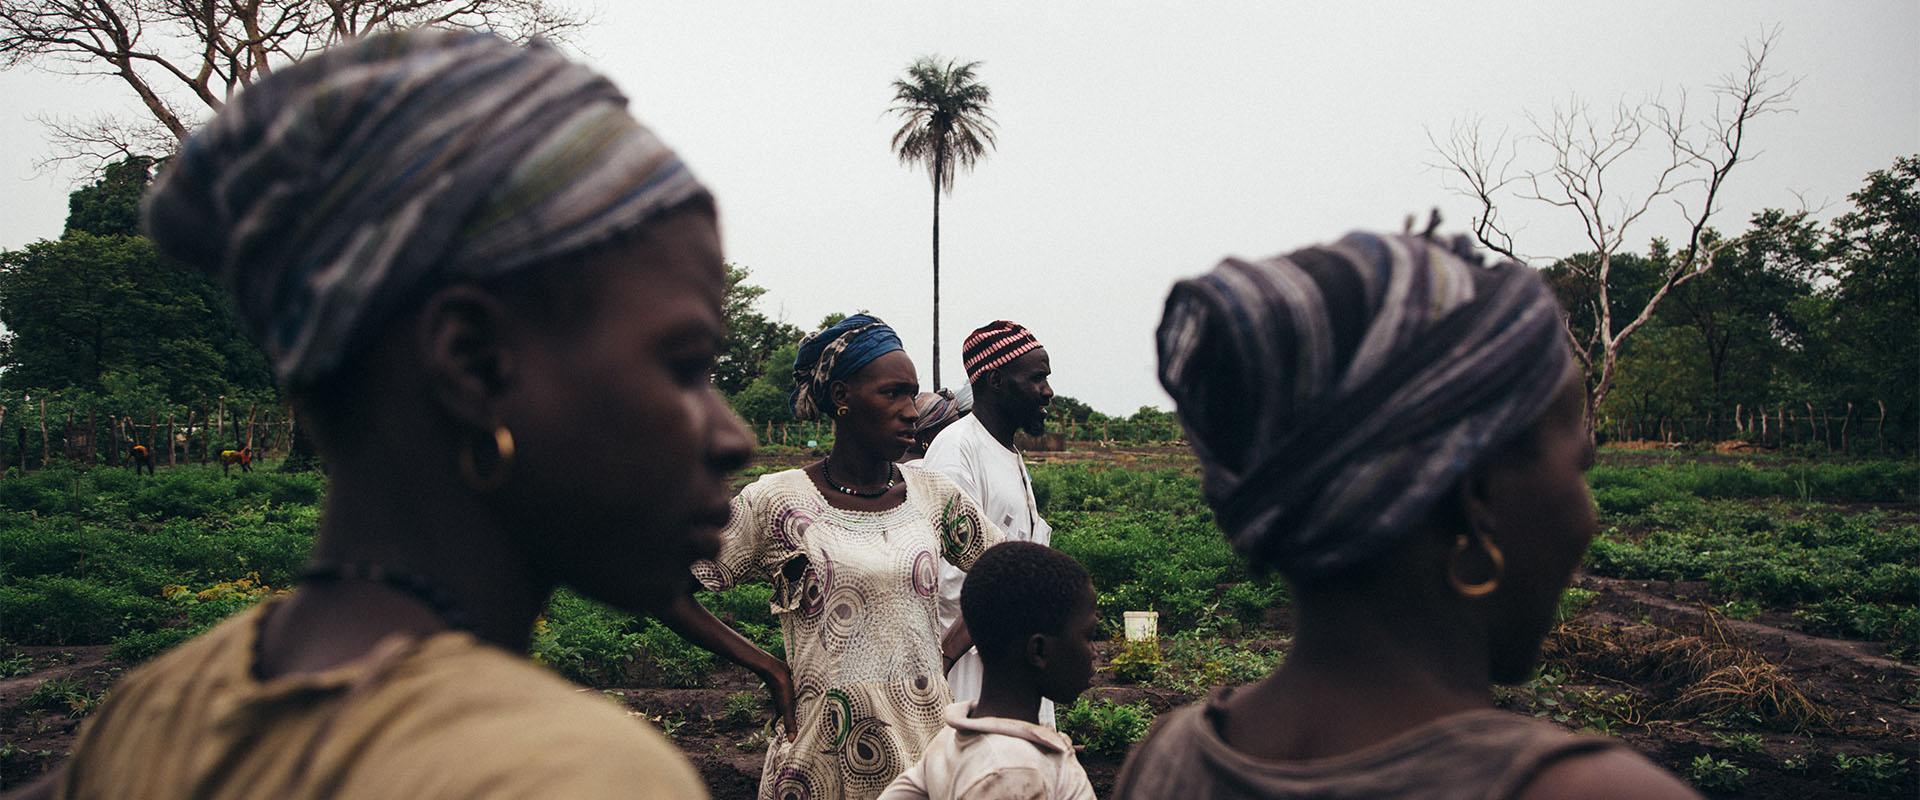 orto donne Guinea Bissau Mani Tese 2017